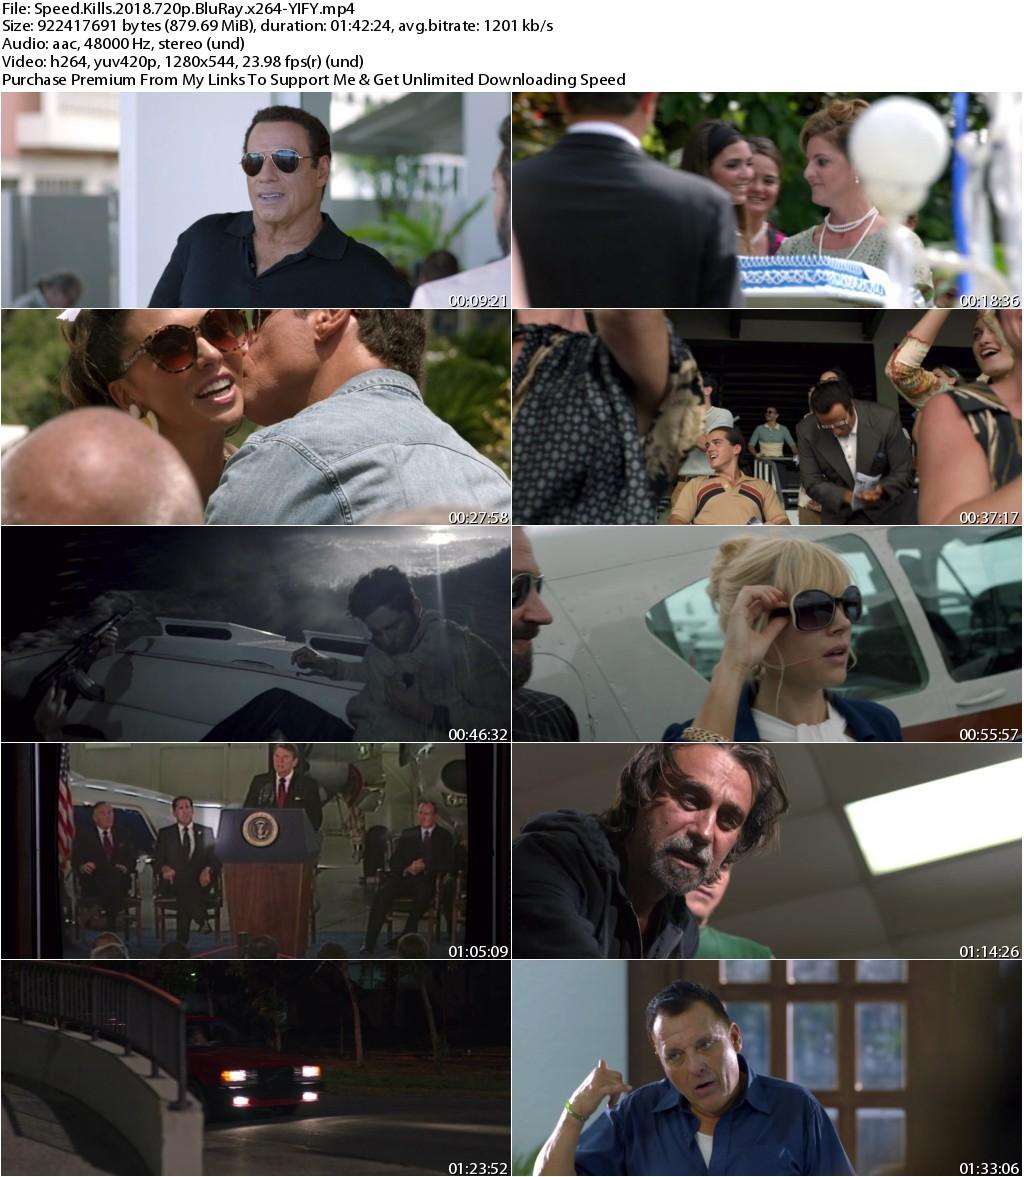 Speed Kills (2018) 720p BluRay x264-YIFY